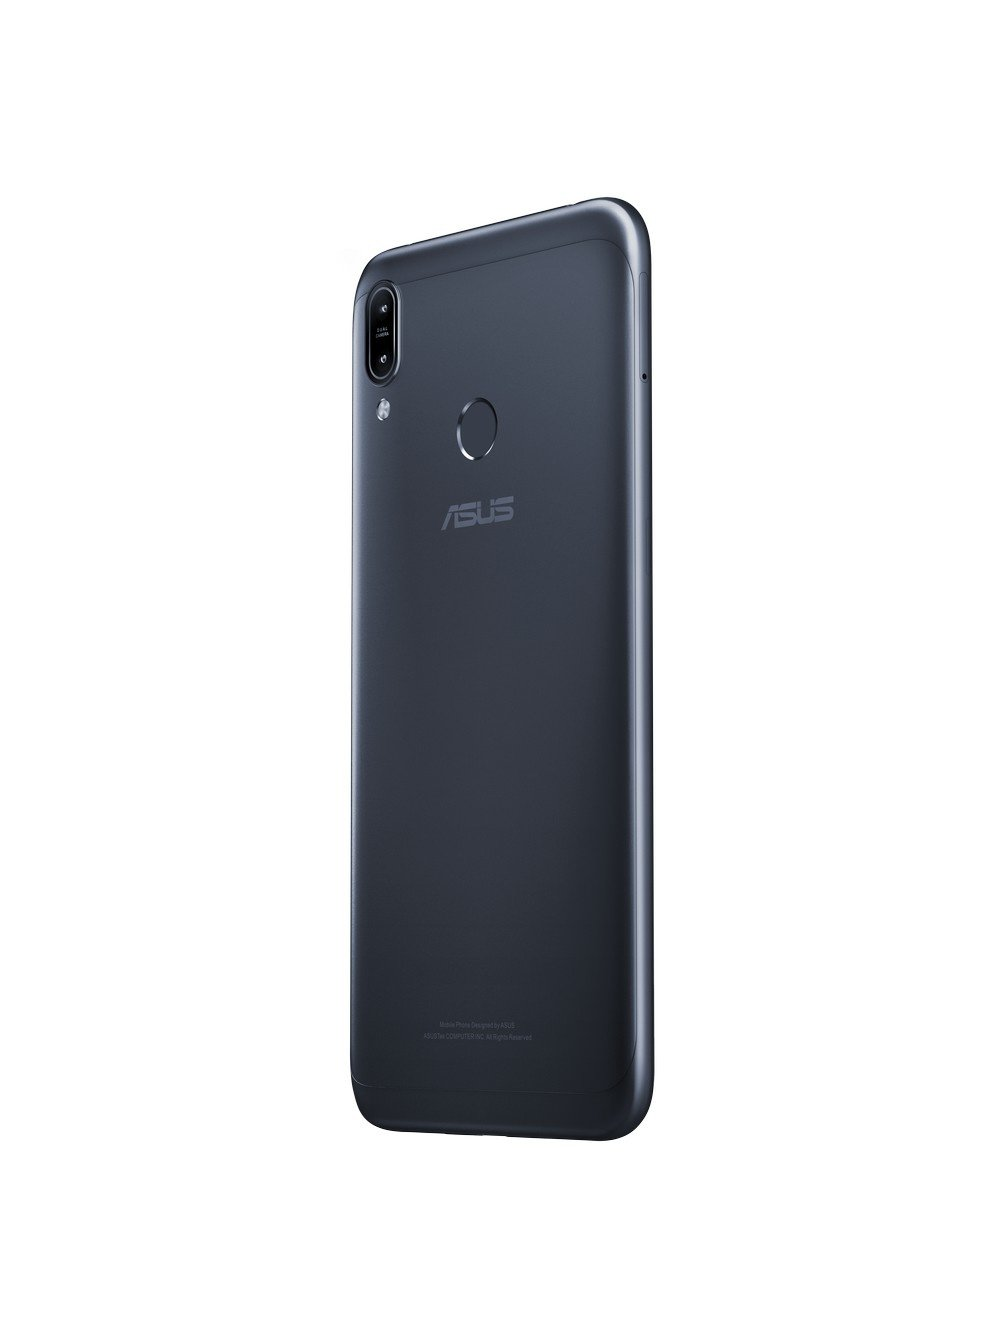 Смартфон Asus ZenFone Max (M2) (ZB633KL-4A070EU) 4/32 GB DUALSIM Black с чехлом фото 12